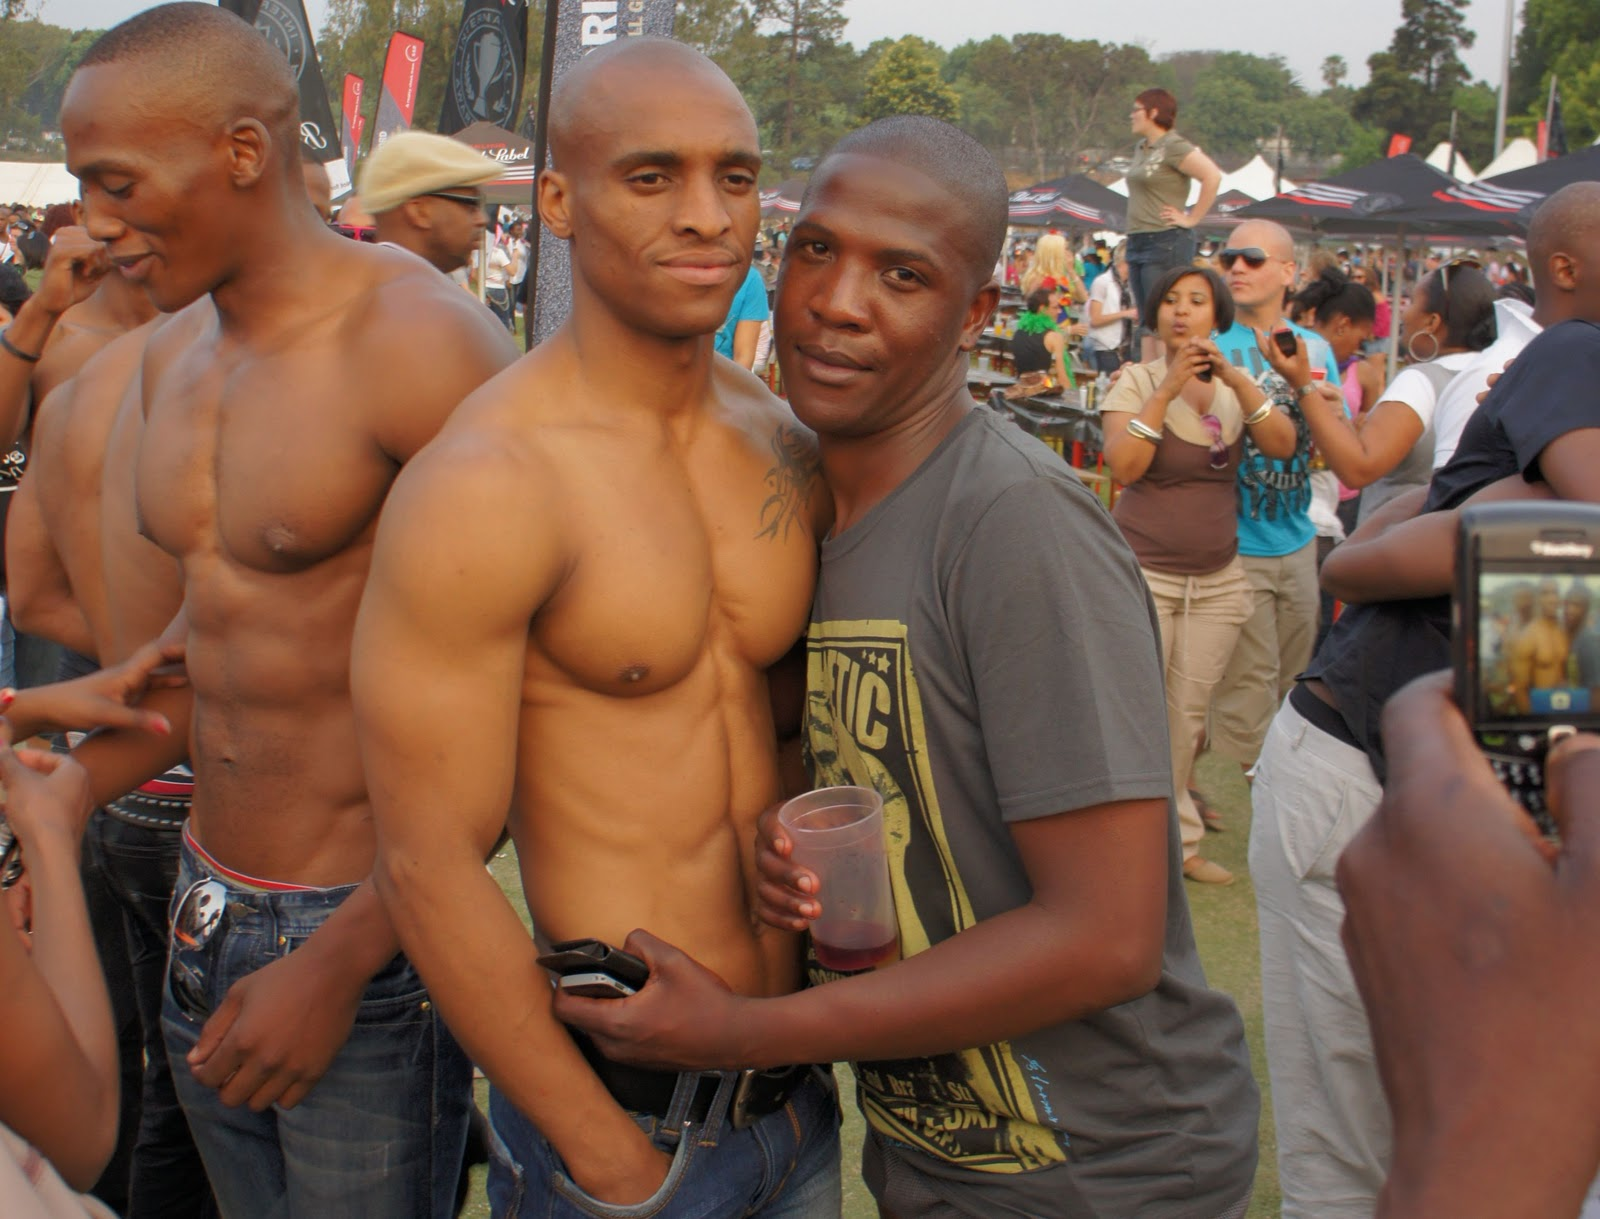 eugene h u0150n   ceramic artist  joburg gay pride 2011  desire